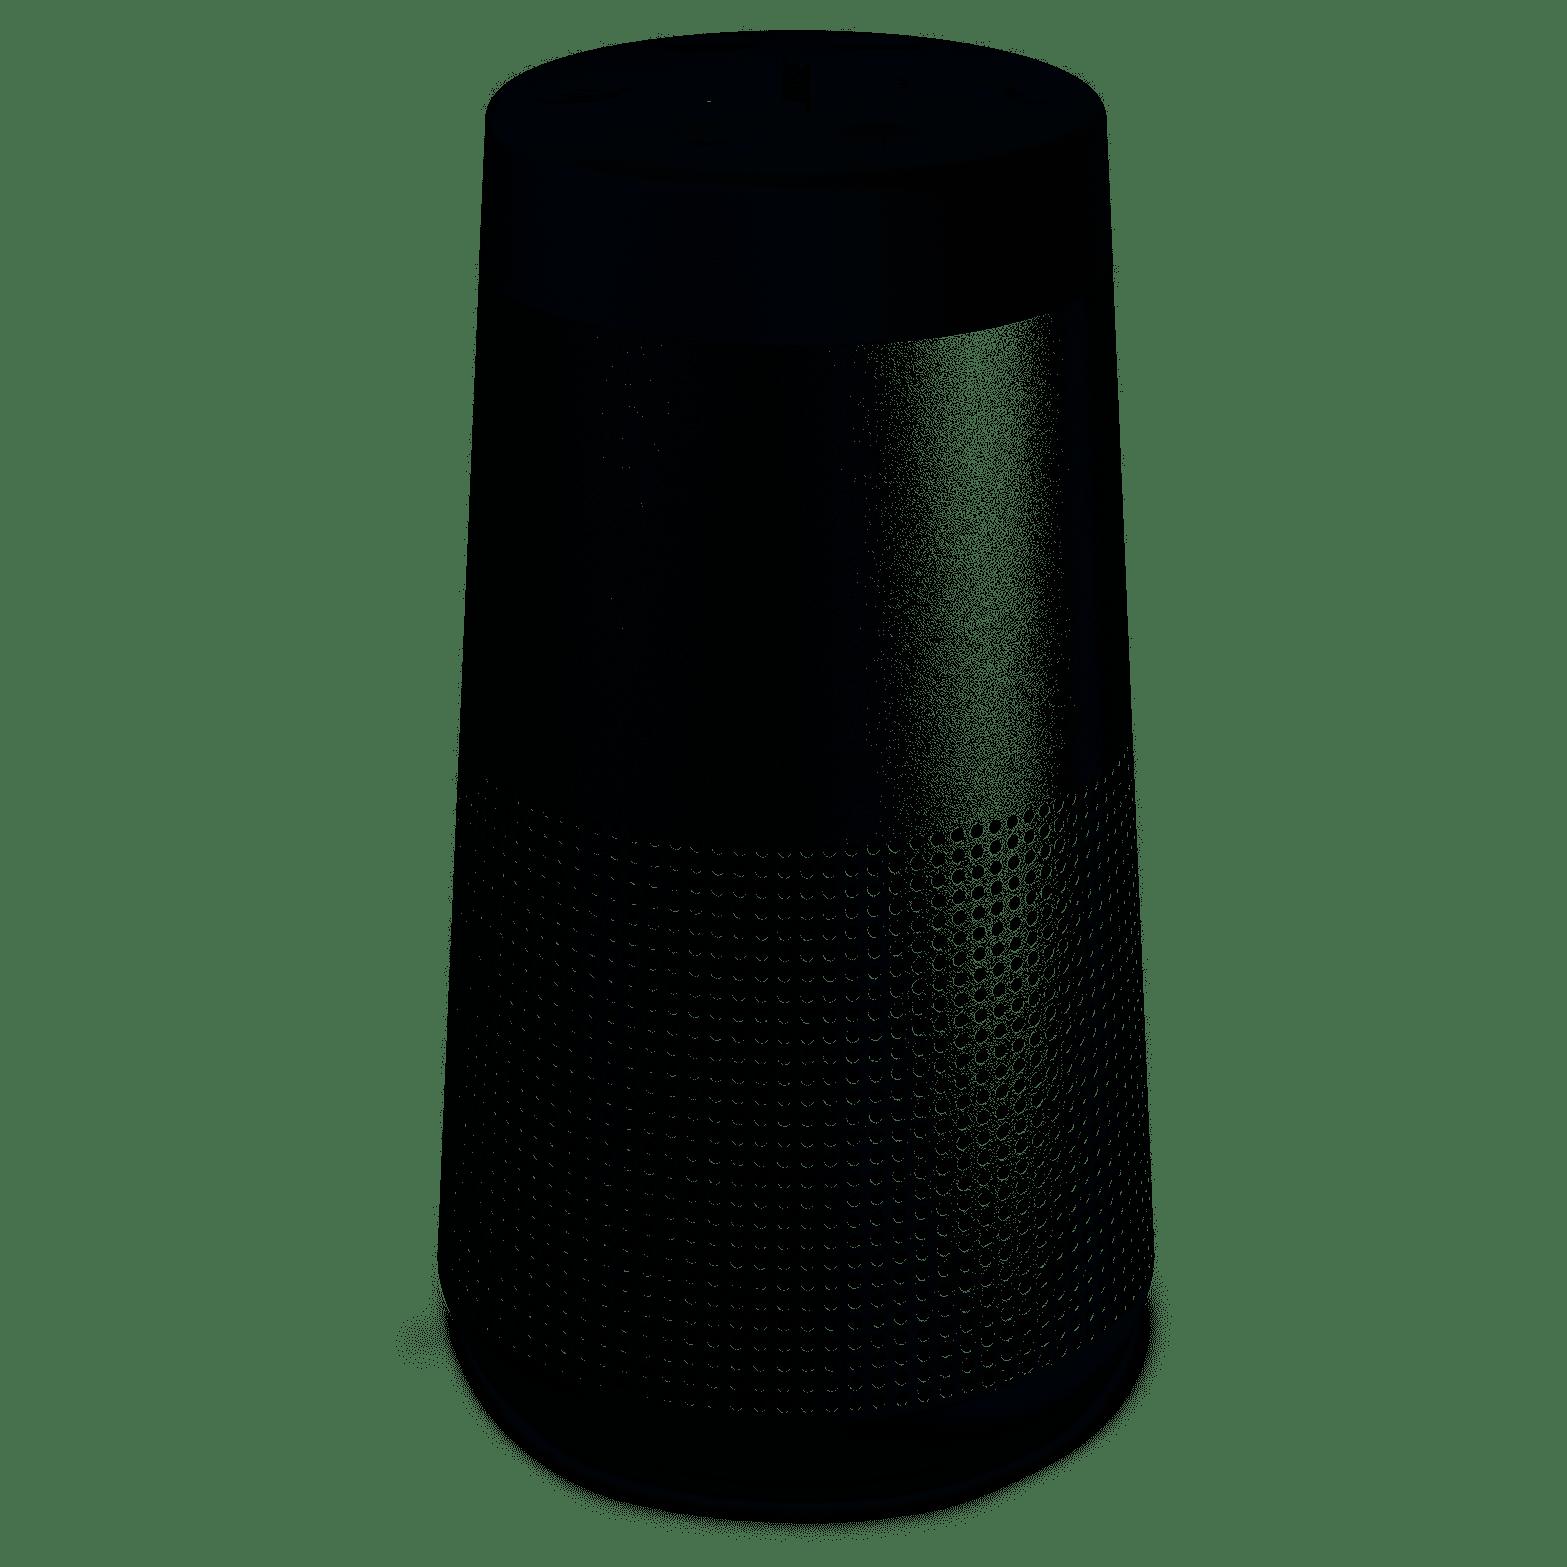 Bose-revolve-2.png